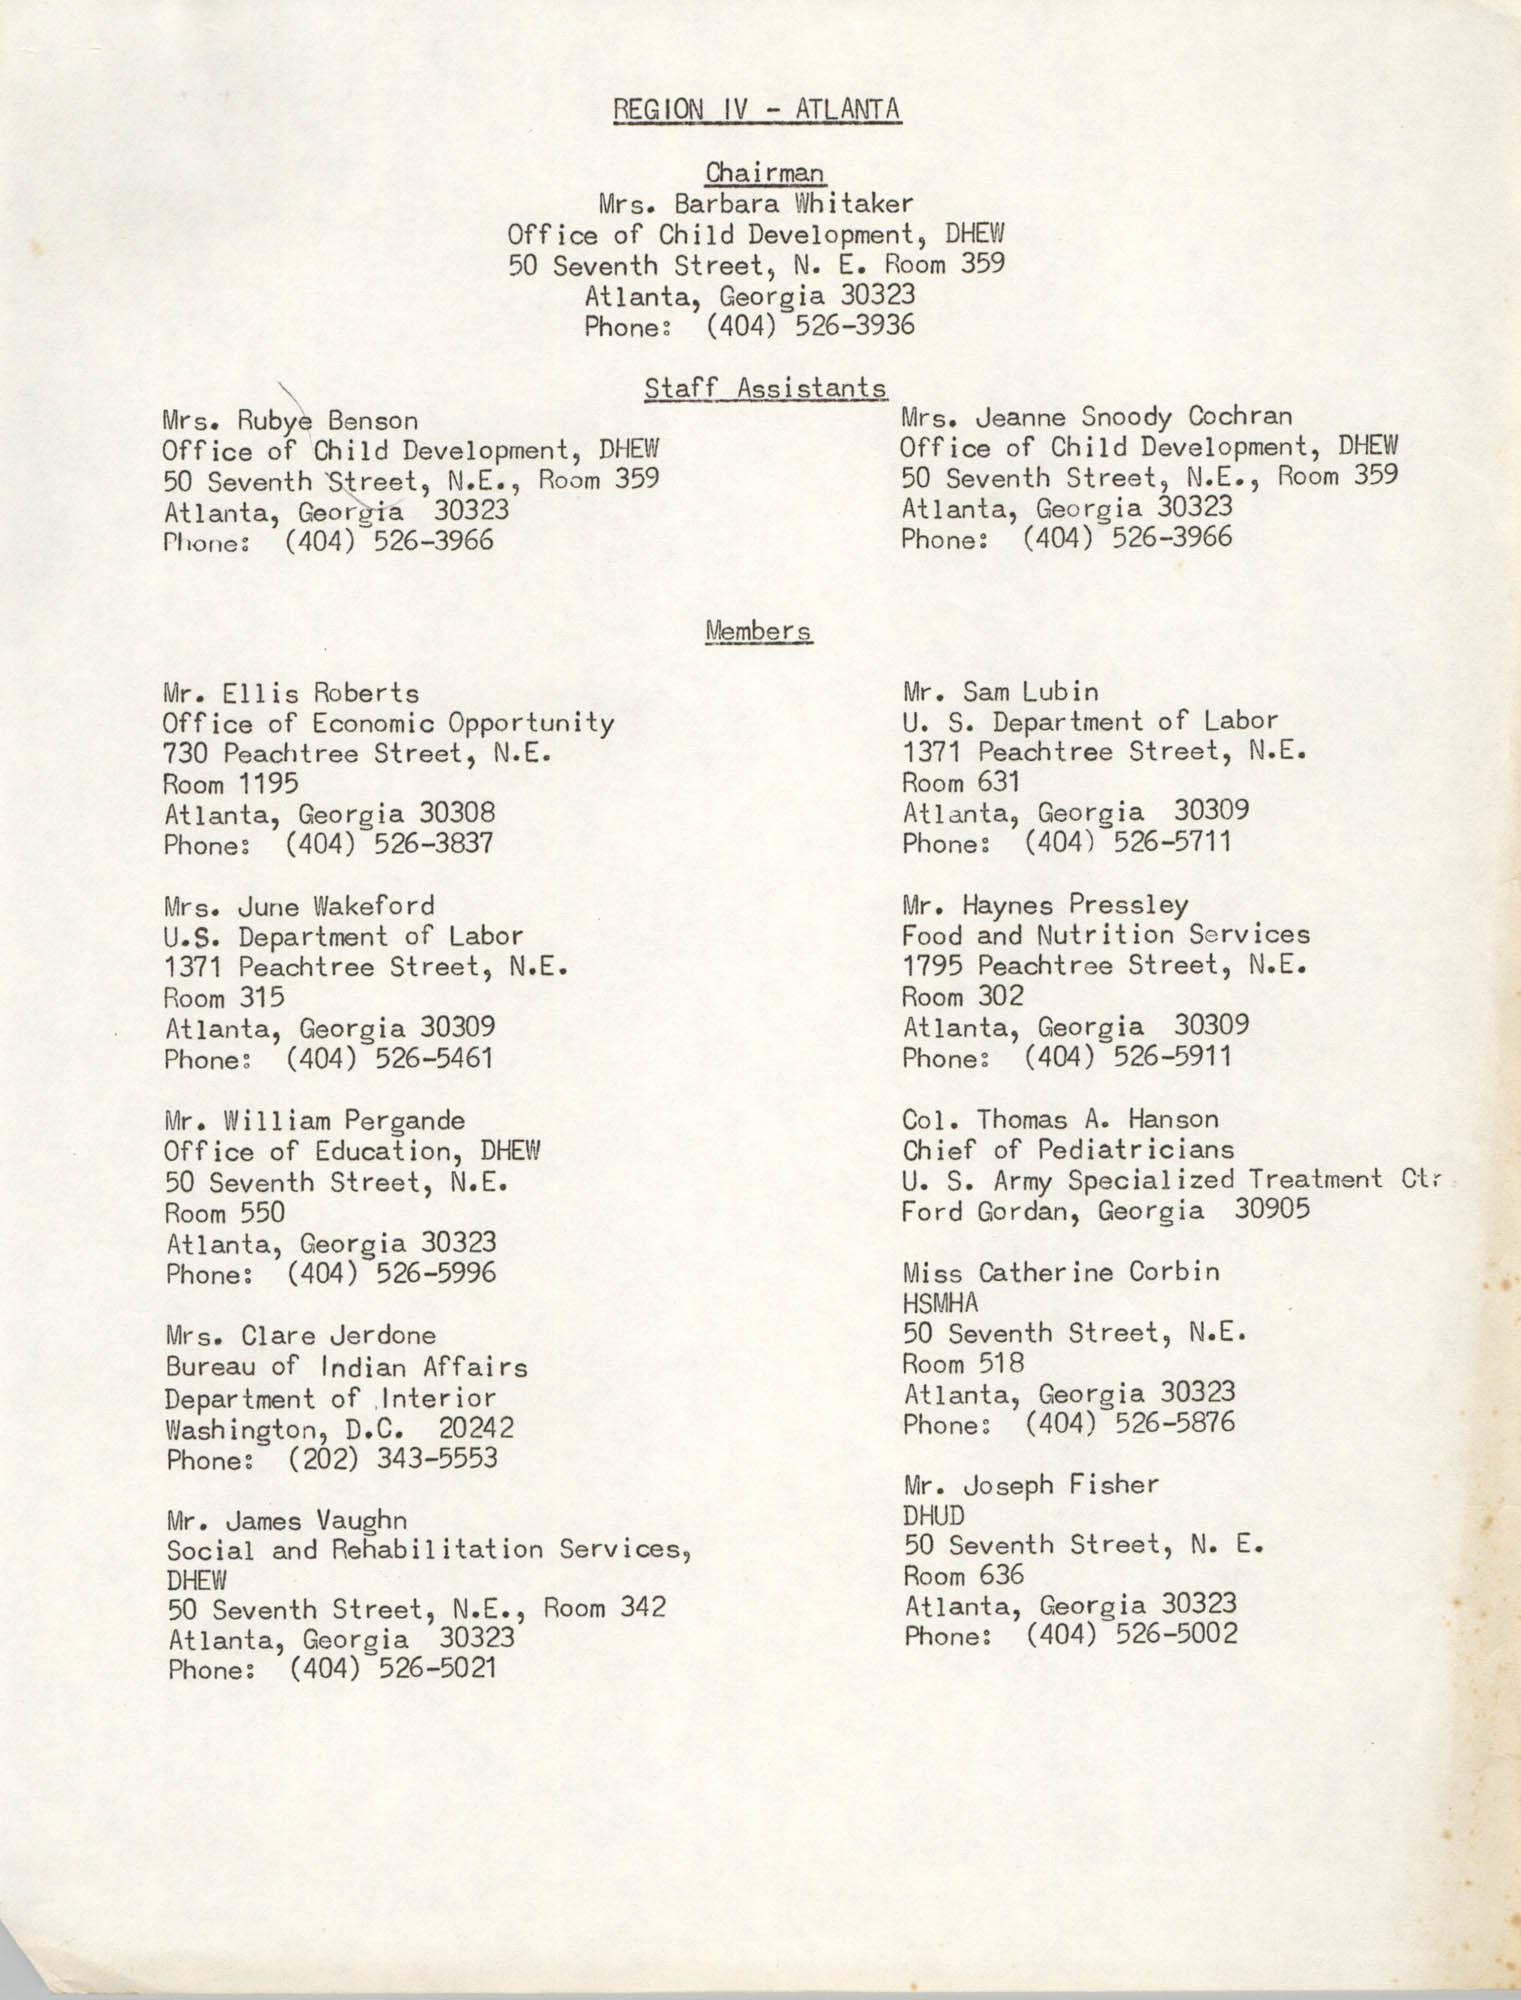 Region IV Staff and Member List